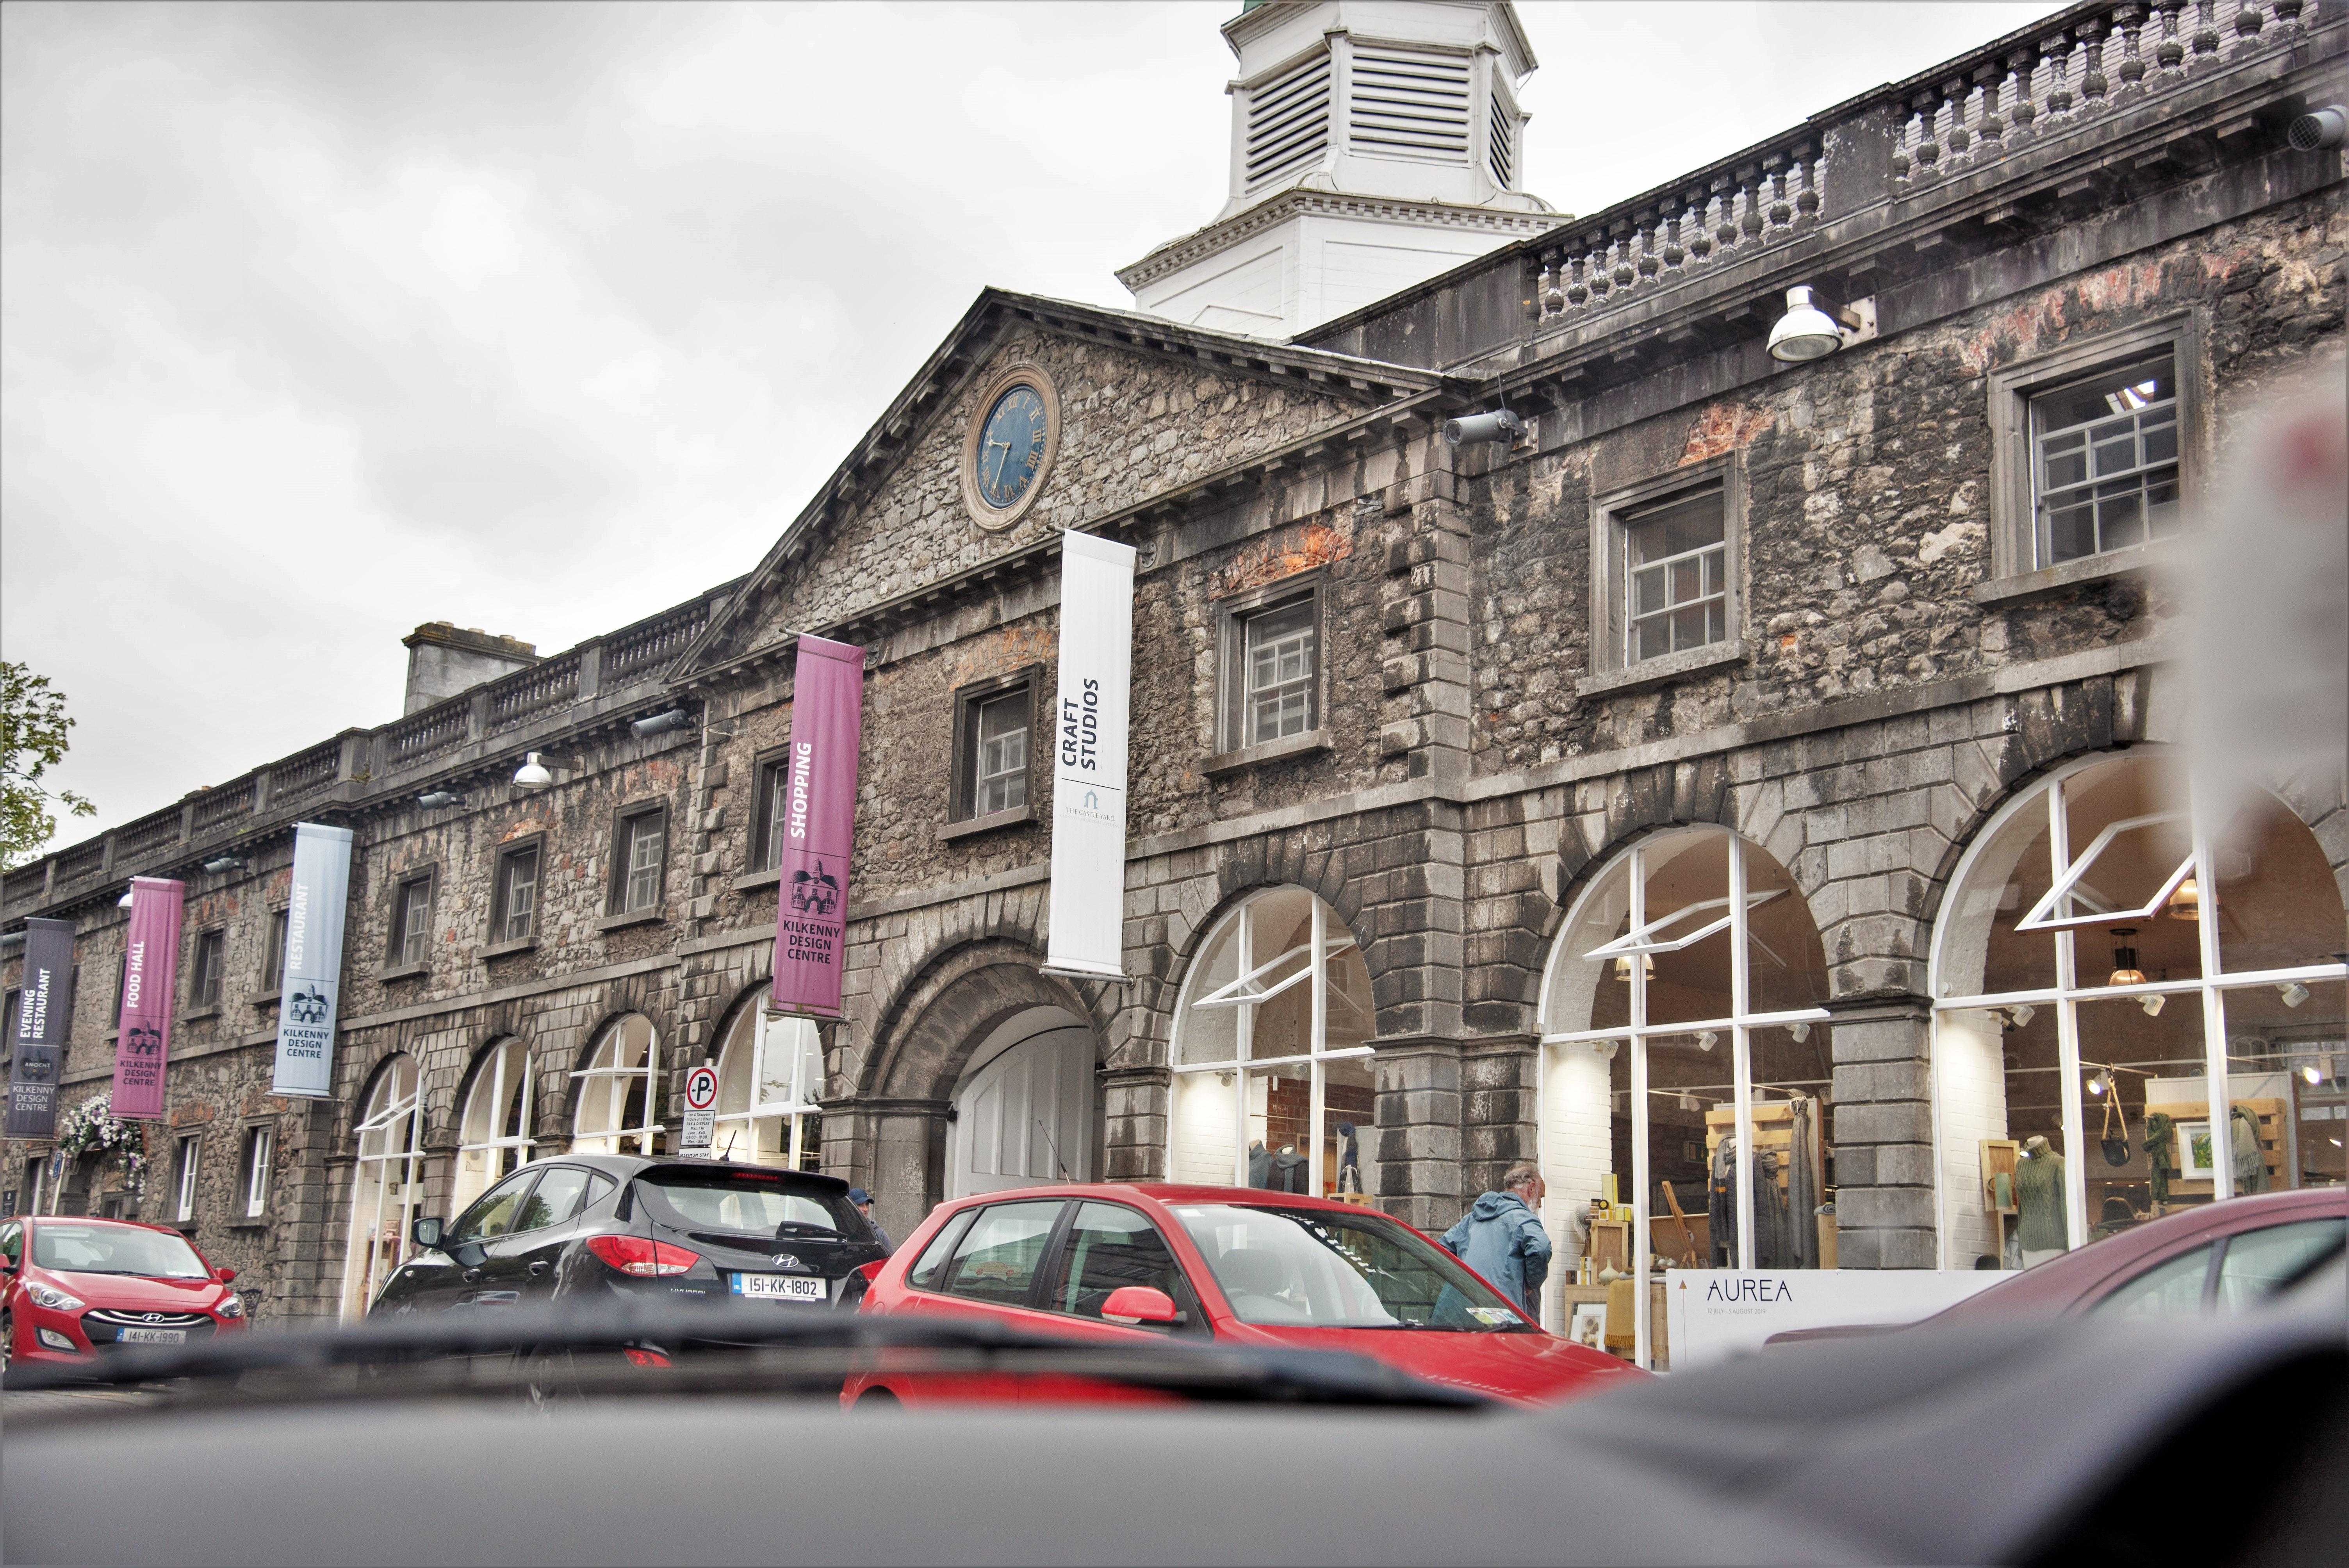 kilkenny, visit to kilkenny, visit kilkenny, design centre